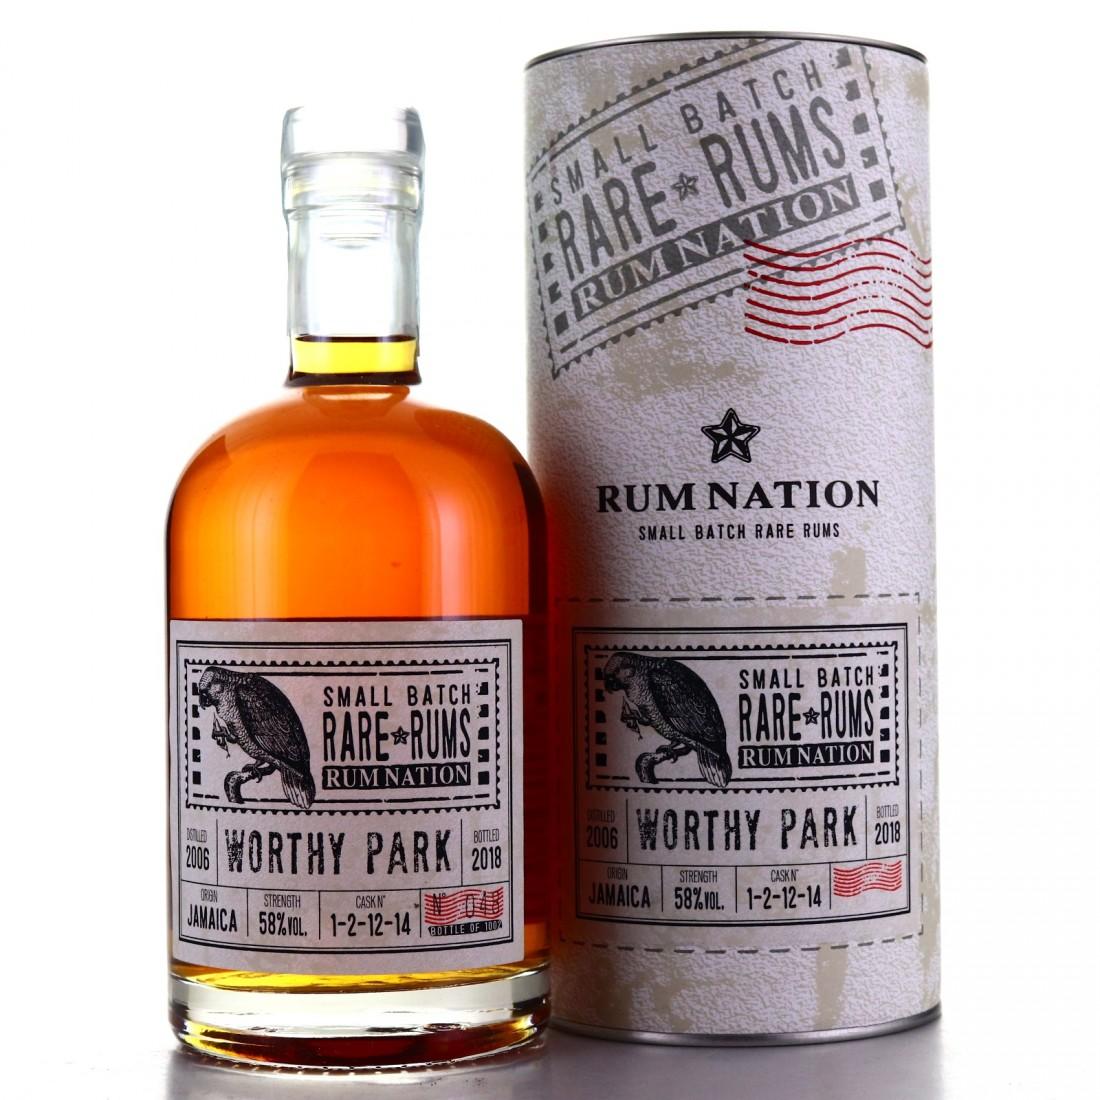 Worthy Park 2006 Rum Nation Small Batch